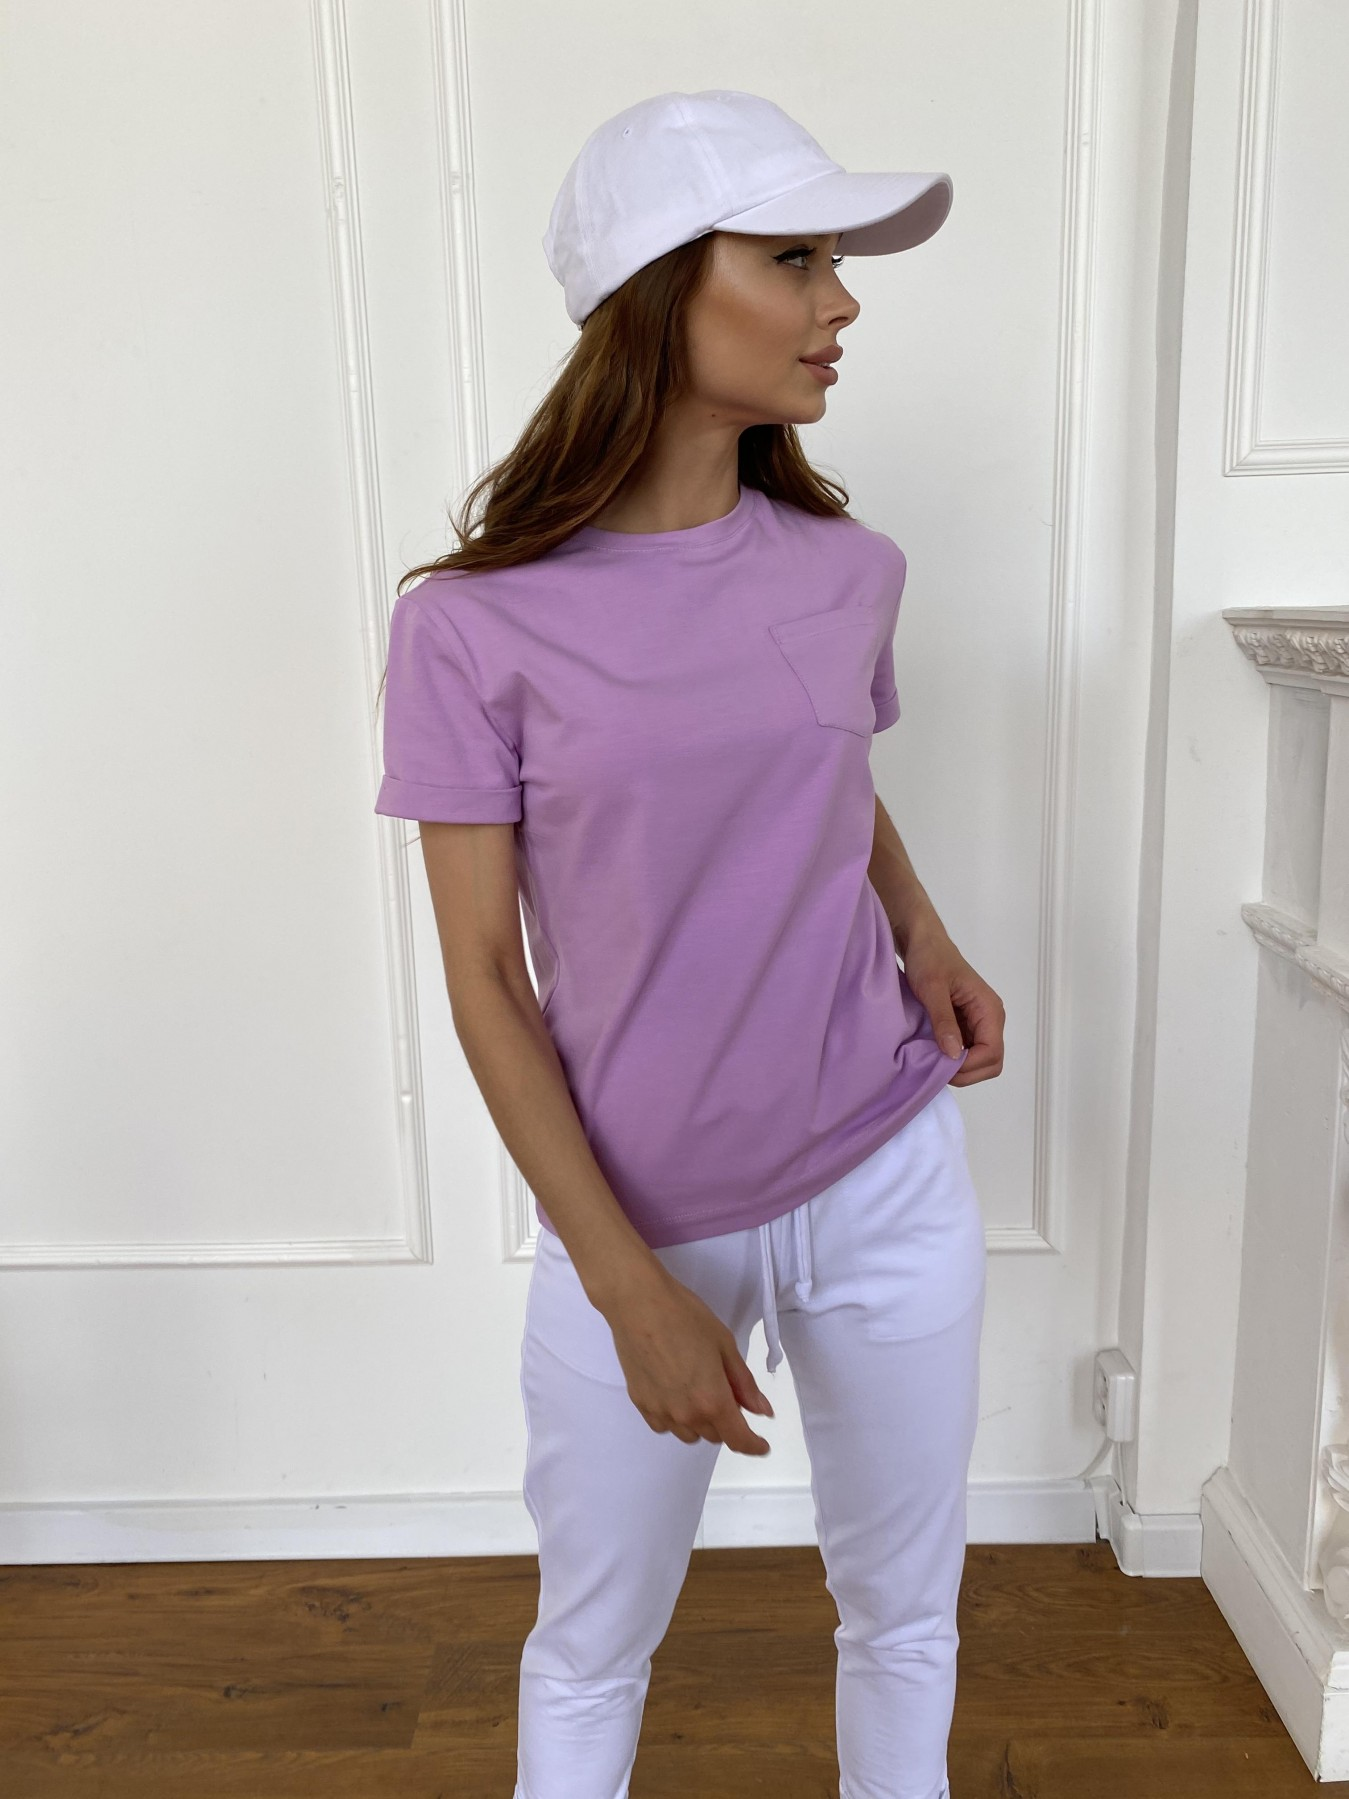 Вуди футболка из вискозы 11224 АРТ. 47879 Цвет: Лаванда - фото 2, интернет магазин tm-modus.ru